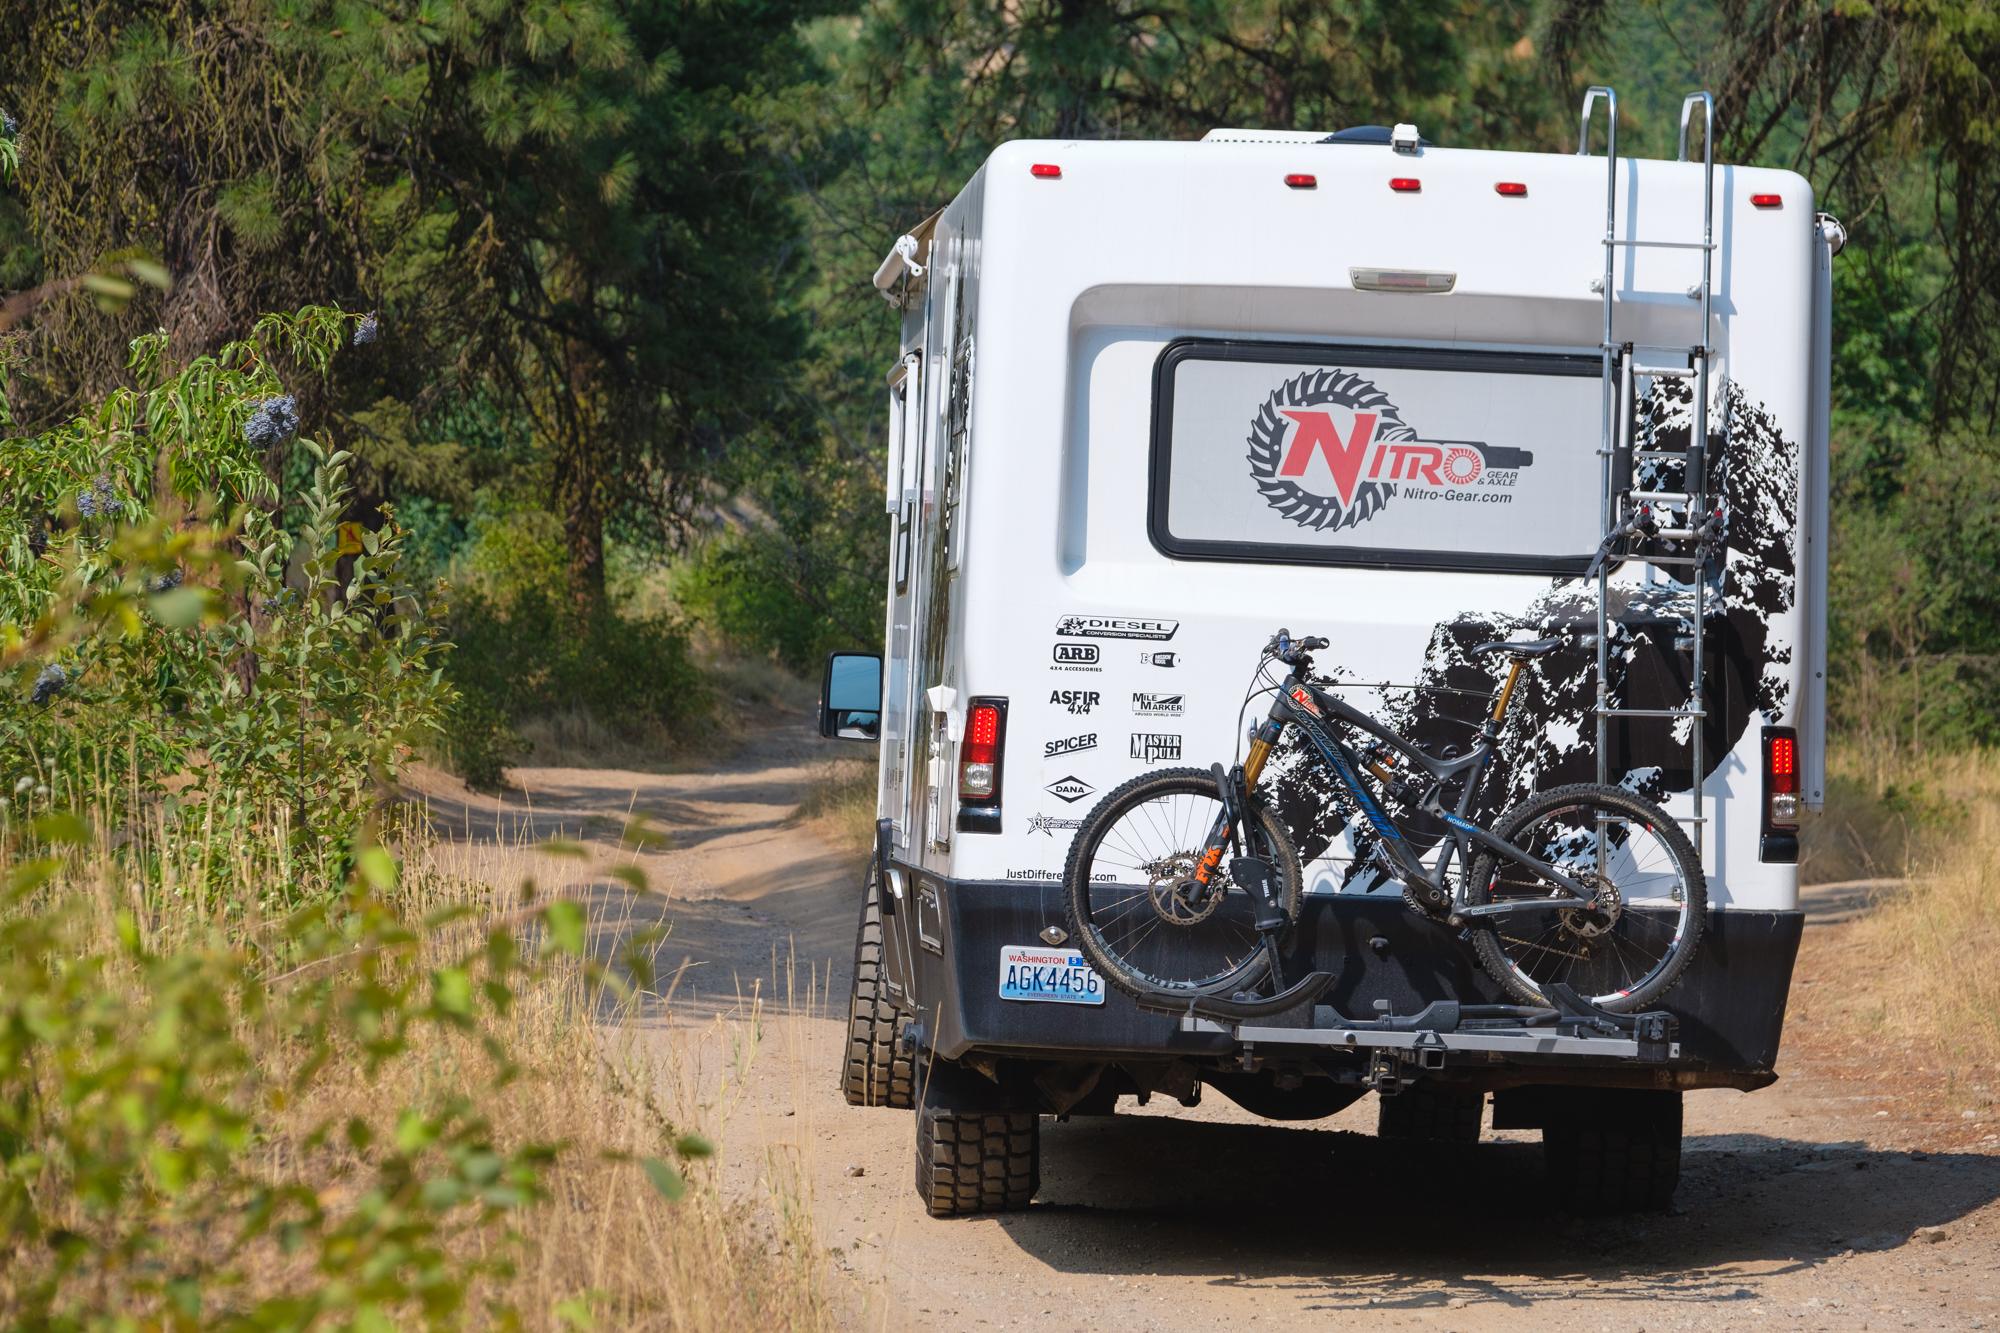 Nitro Gear's Adventure RV – Expedition Portal